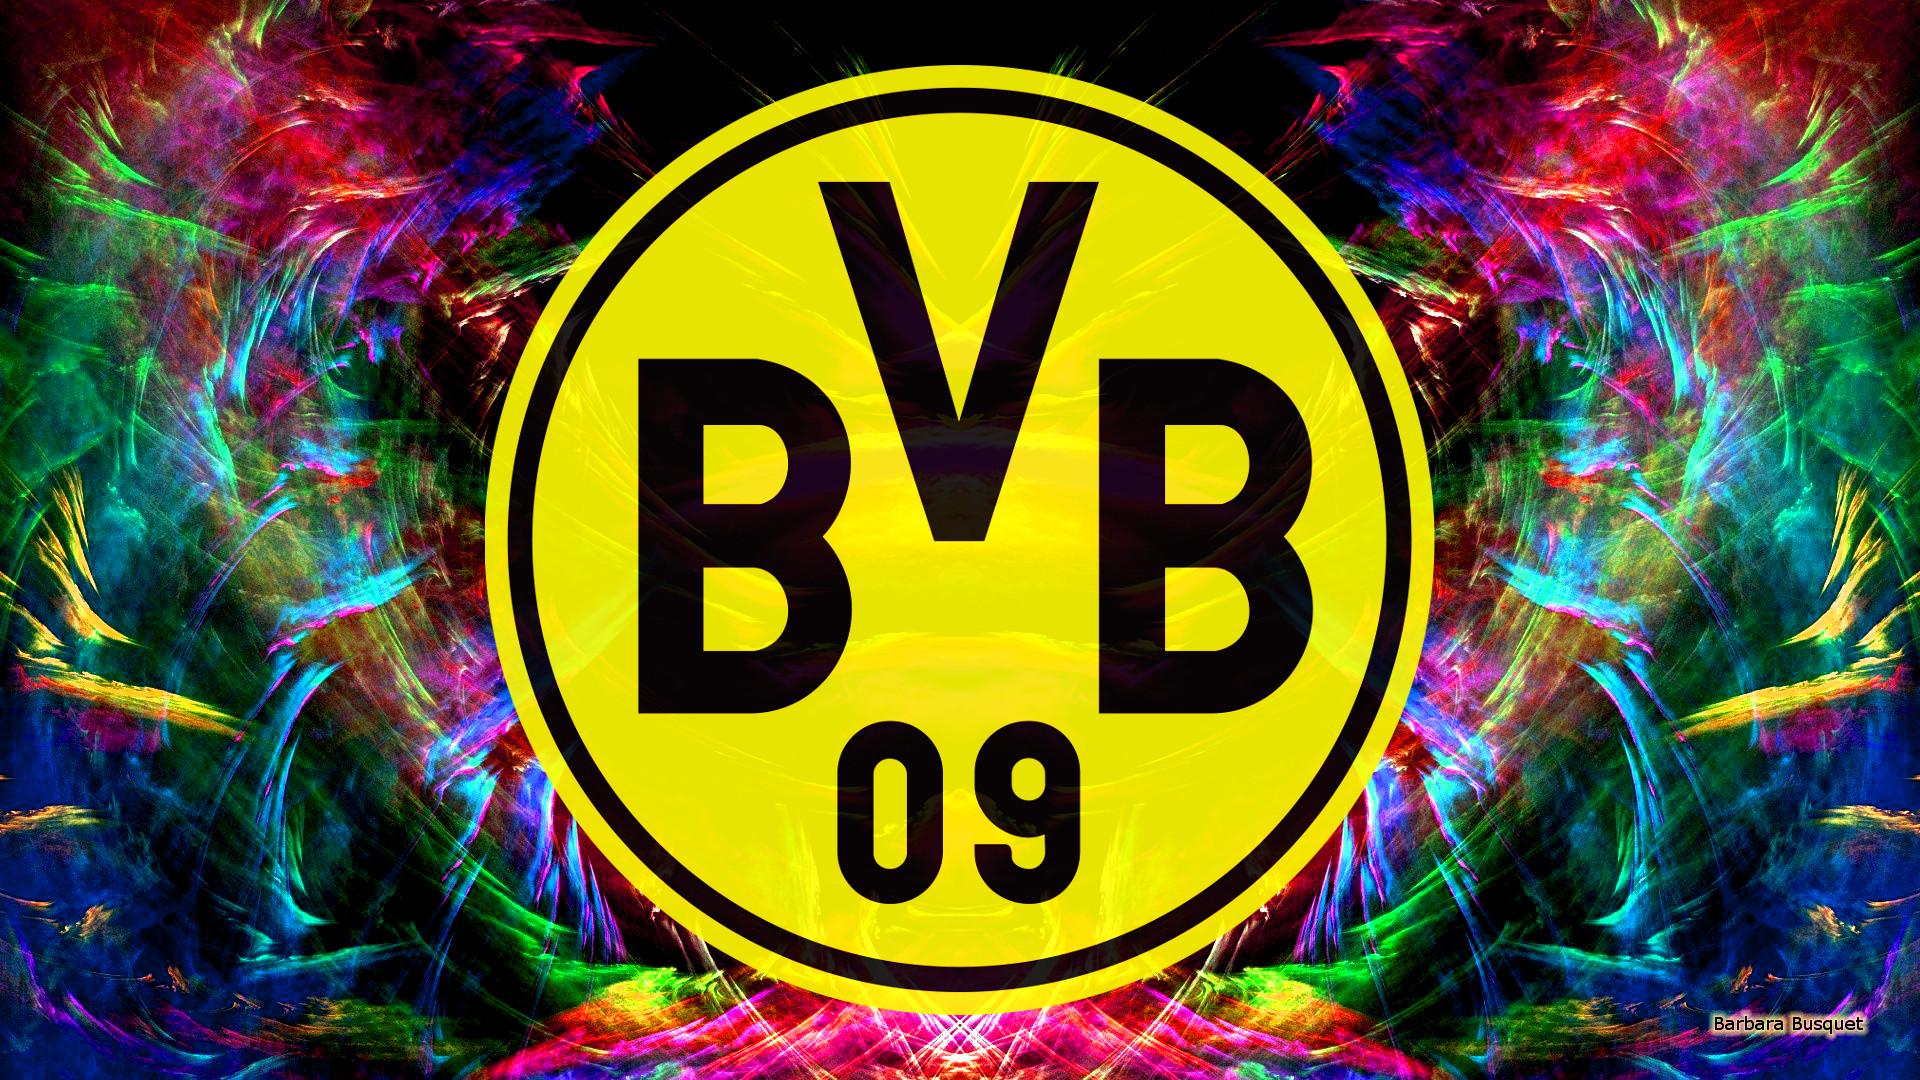 Borussia dortmund wallpapers barbaras hd wallpapers colorful borussia dortmund wallpaper voltagebd Choice Image